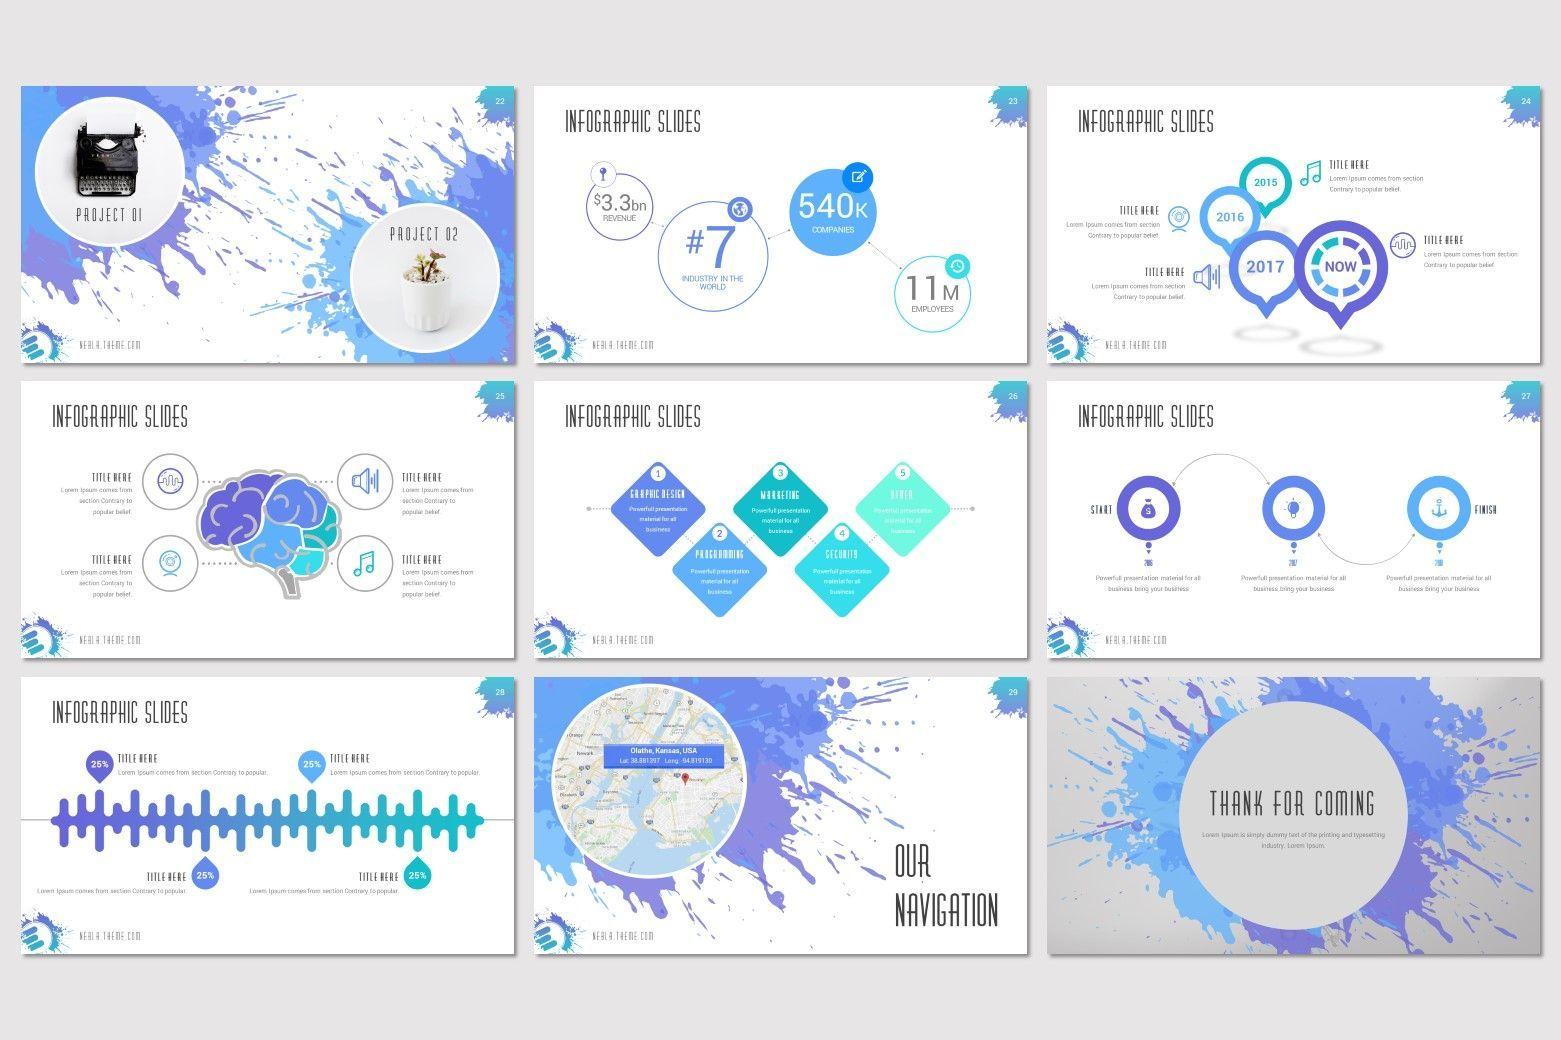 Nebla - Google Slides Template, Slide 5, 08338, Presentation Templates — PoweredTemplate.com